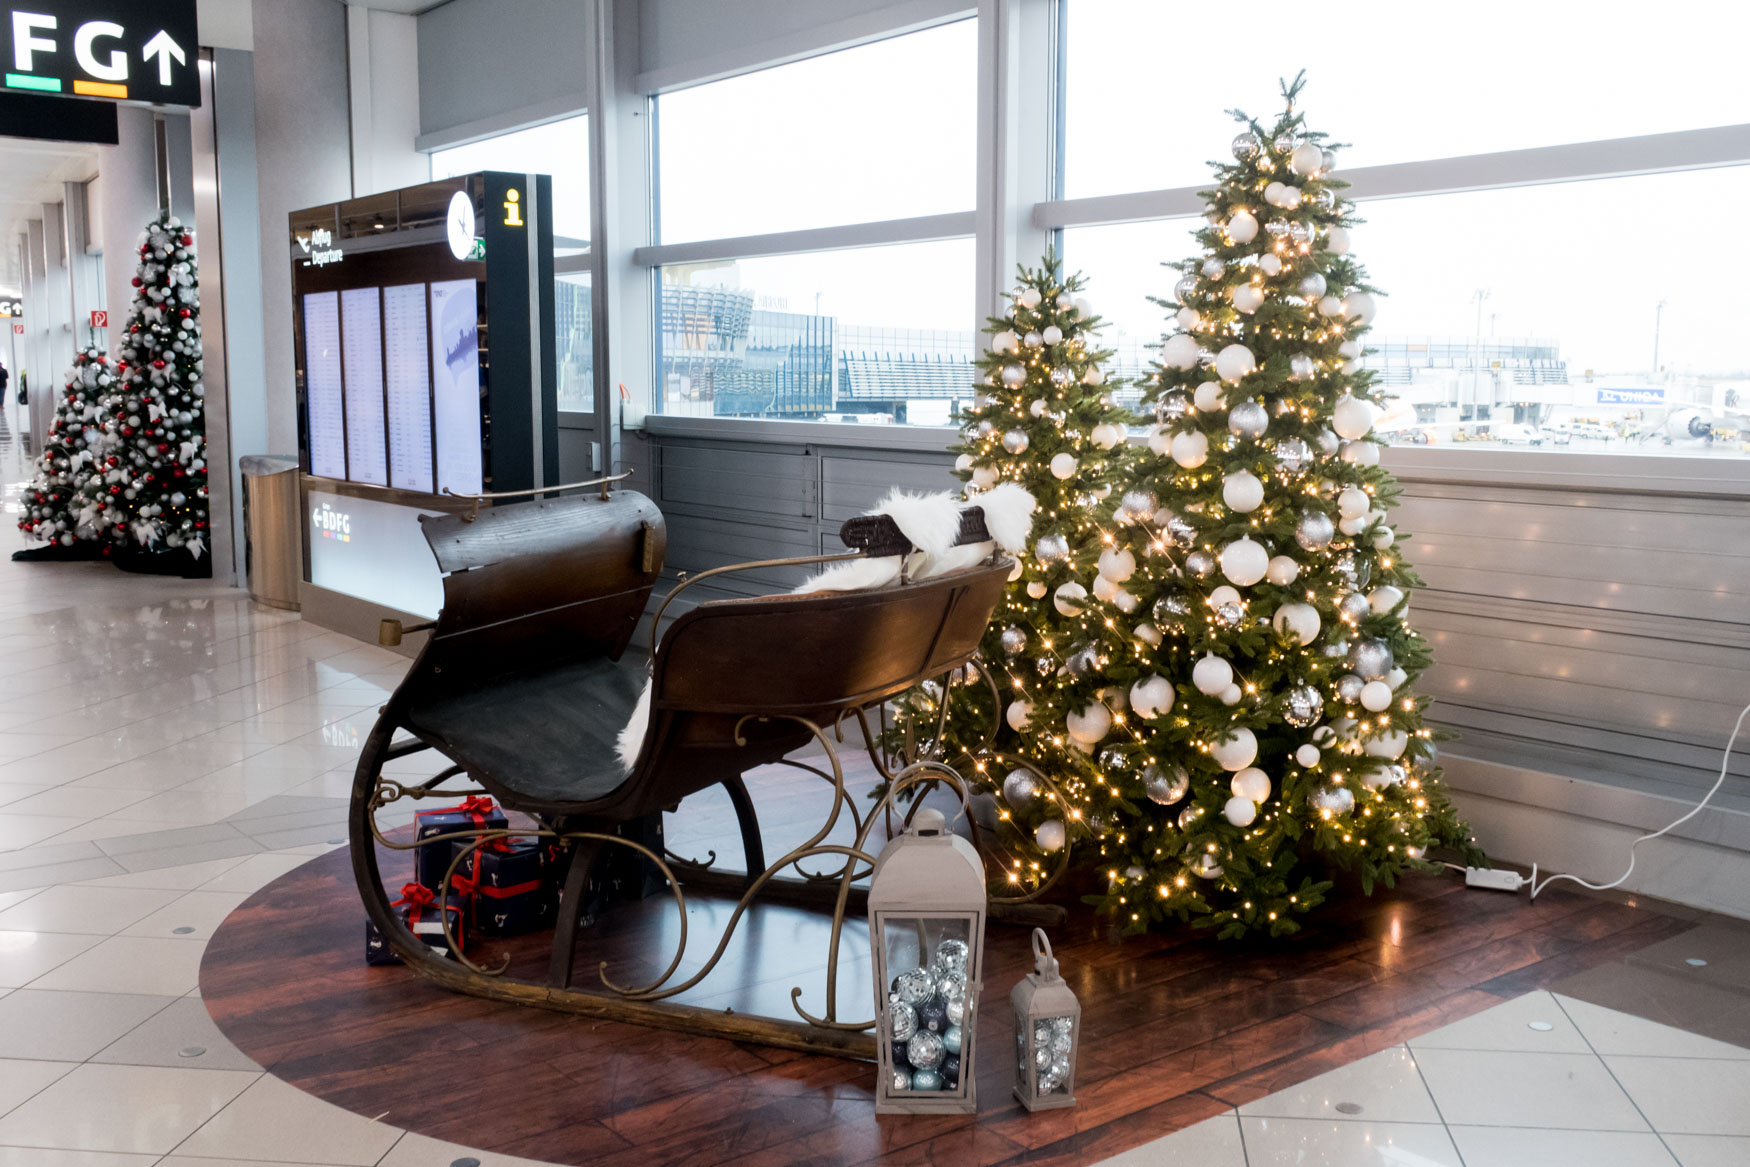 Christmas Decorations at Vienna Airport